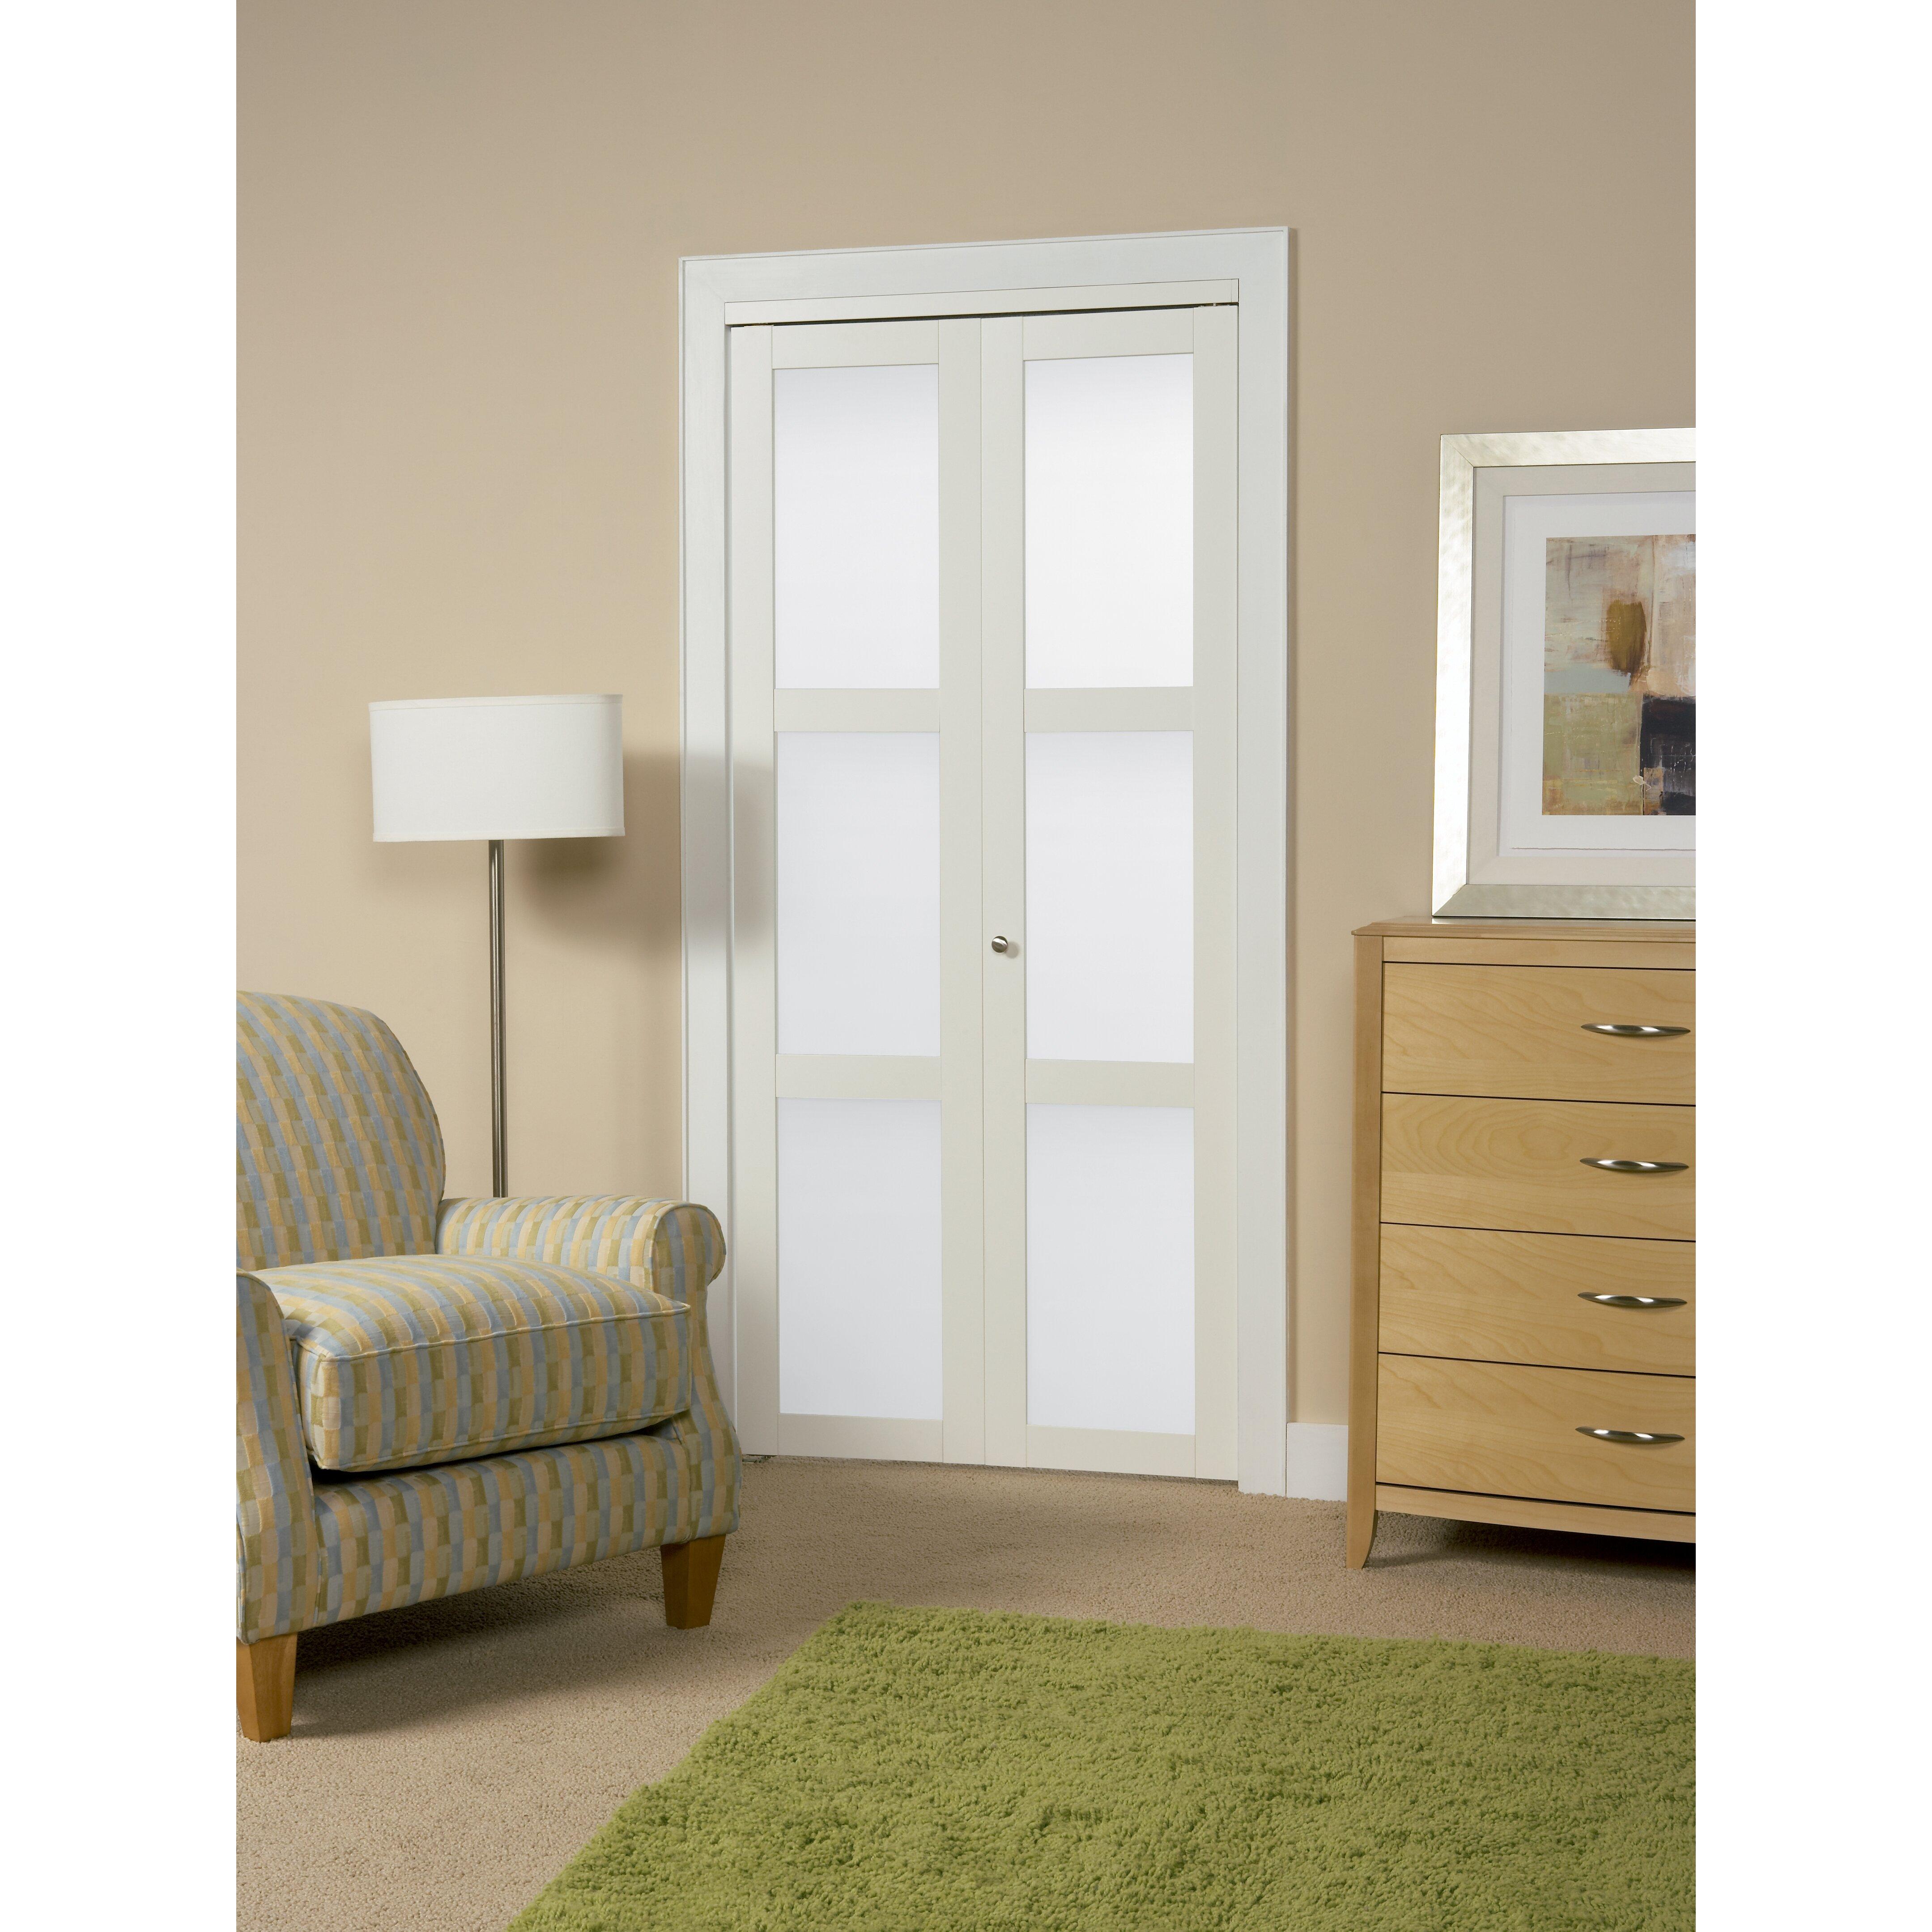 wood 2 panel painted bi fold interior door by erias home snapshot of 22 panel interior wood doors ideas design pics examples